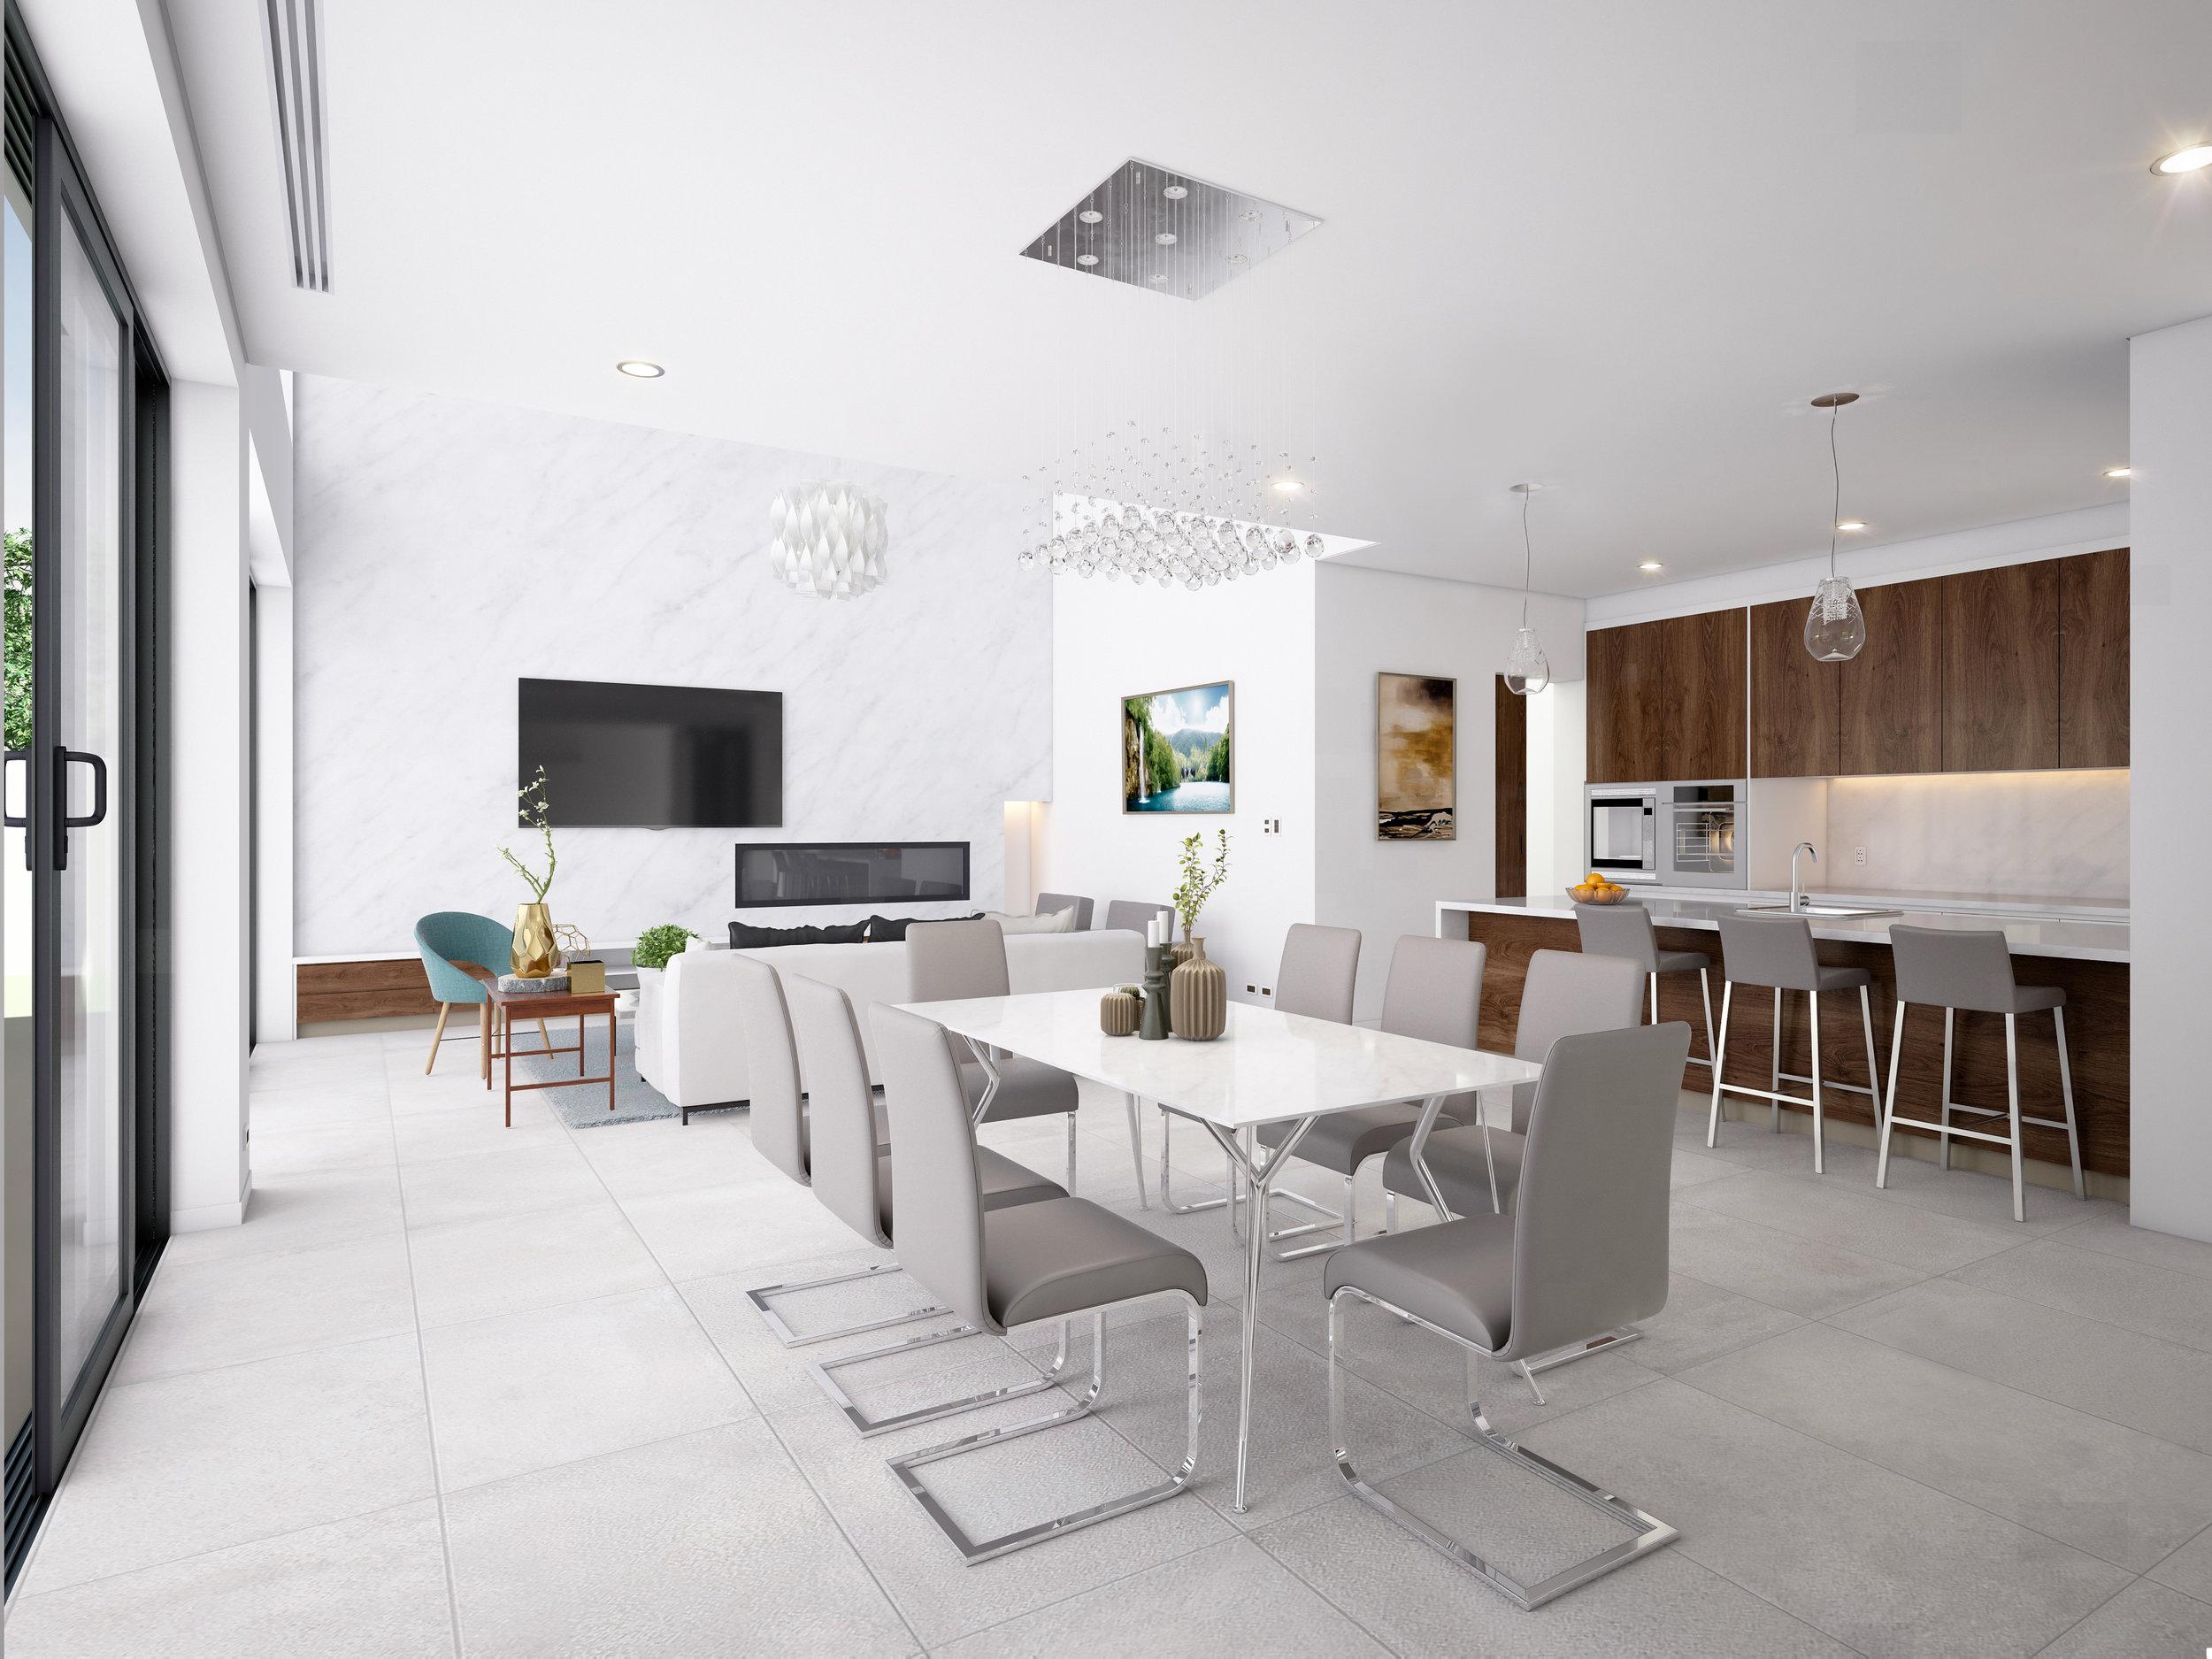 Meritor_Living_Dining_Kitchen_100818.jpg